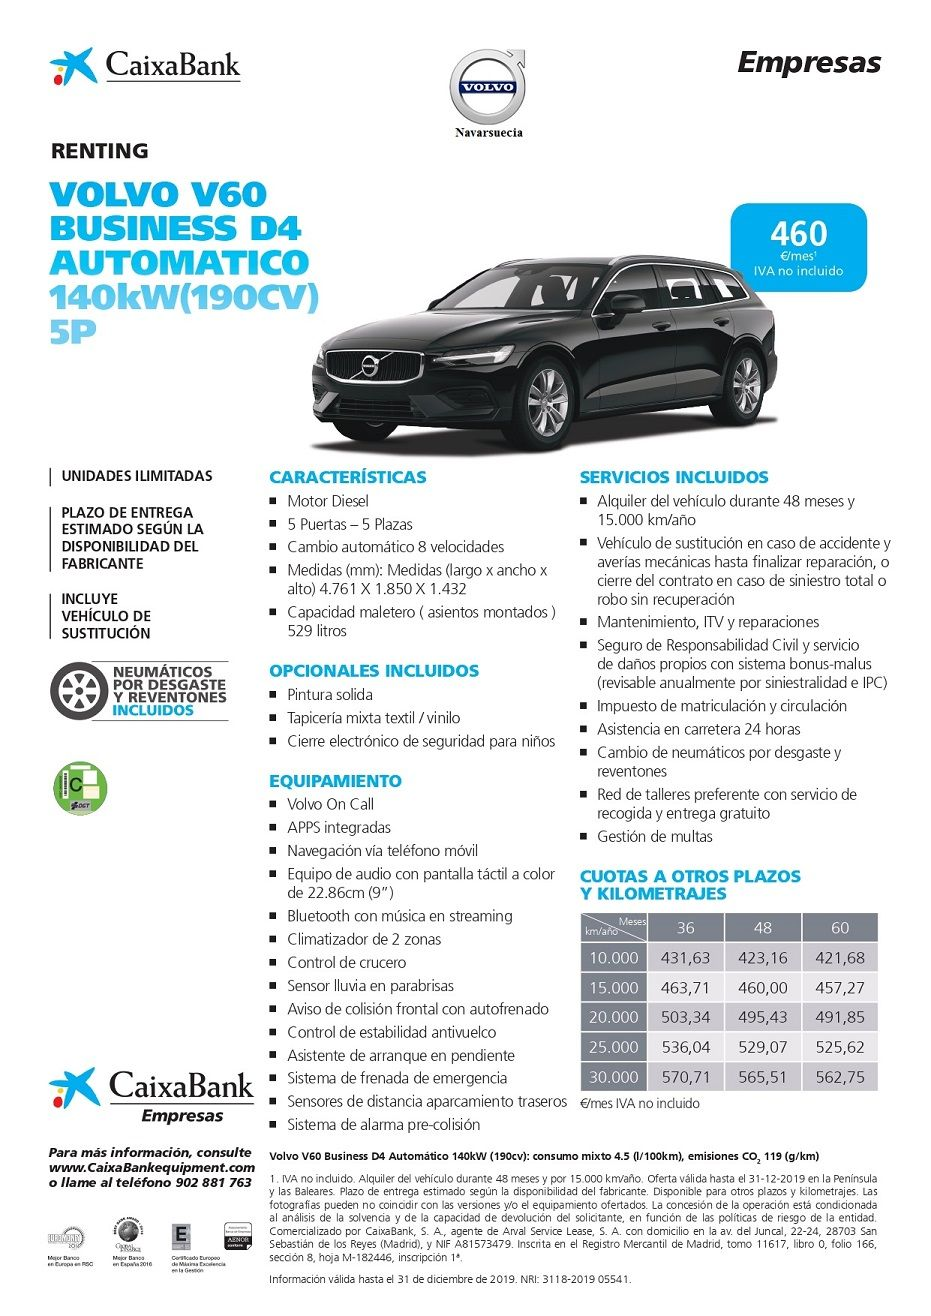 Volvo V60 Business D4 Automático 140kW (190CV) 5P CUOTA RENTING 460€/MES